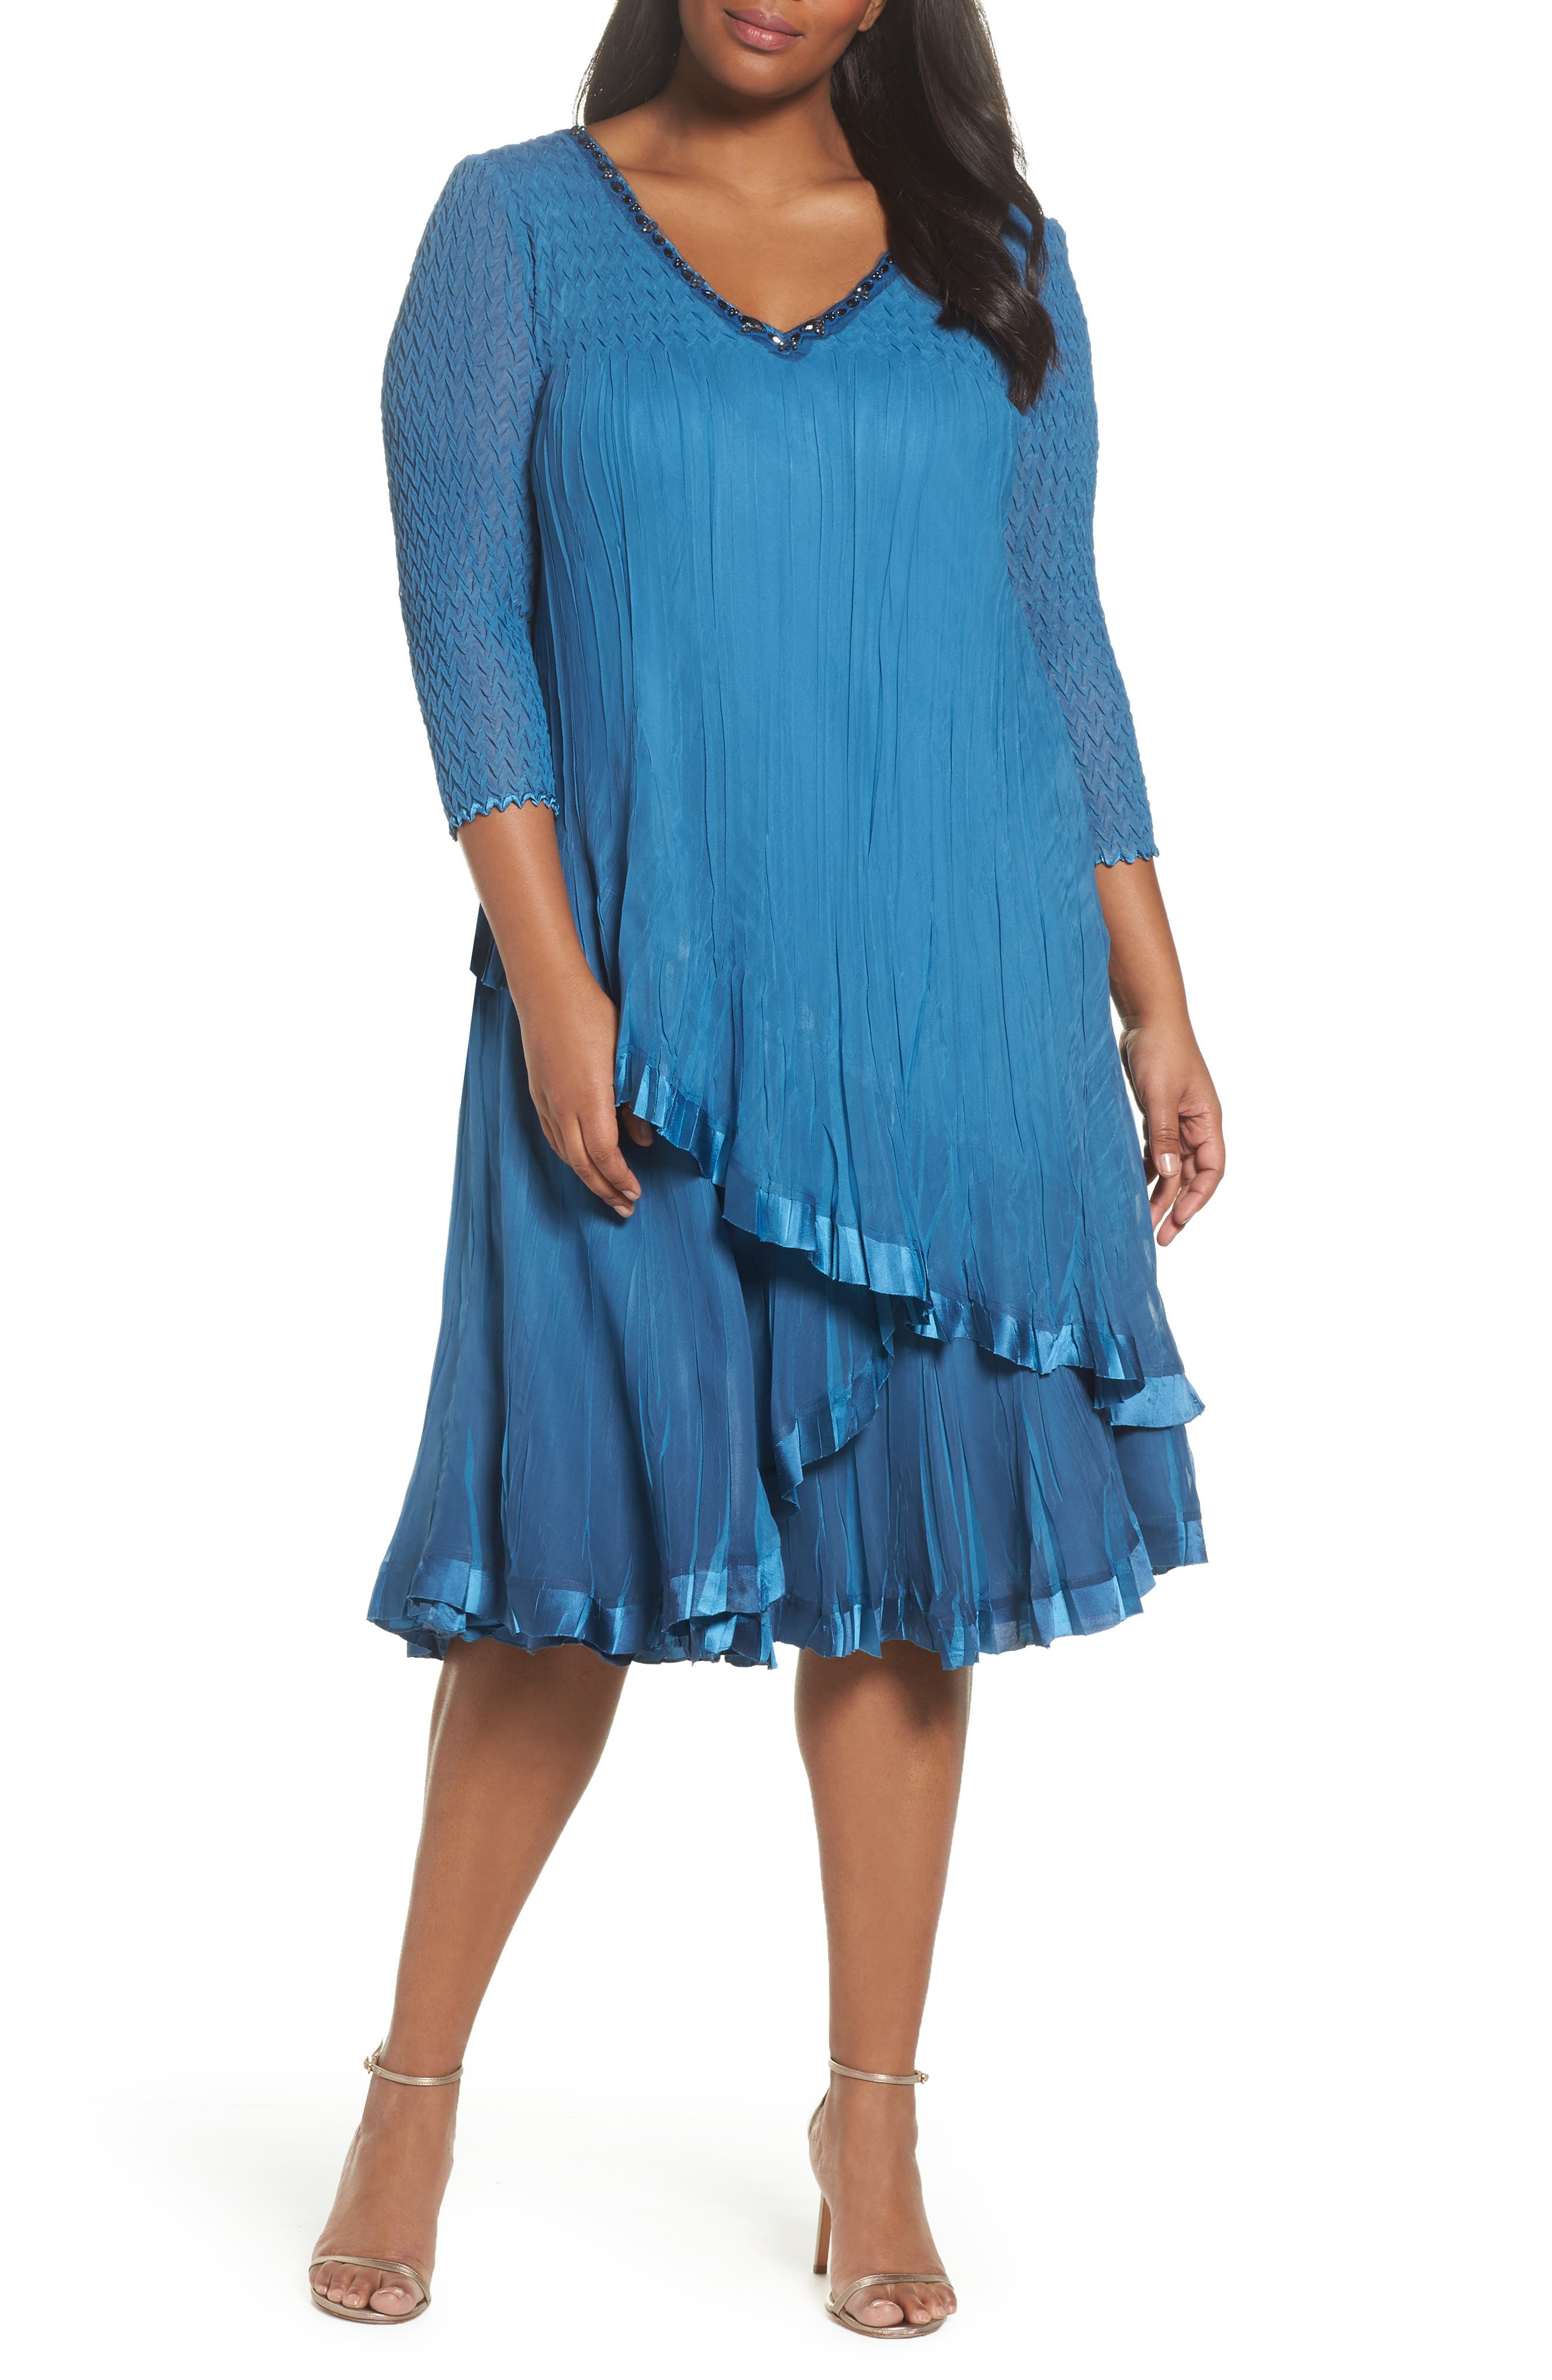 Plus size dresses at nordstrom